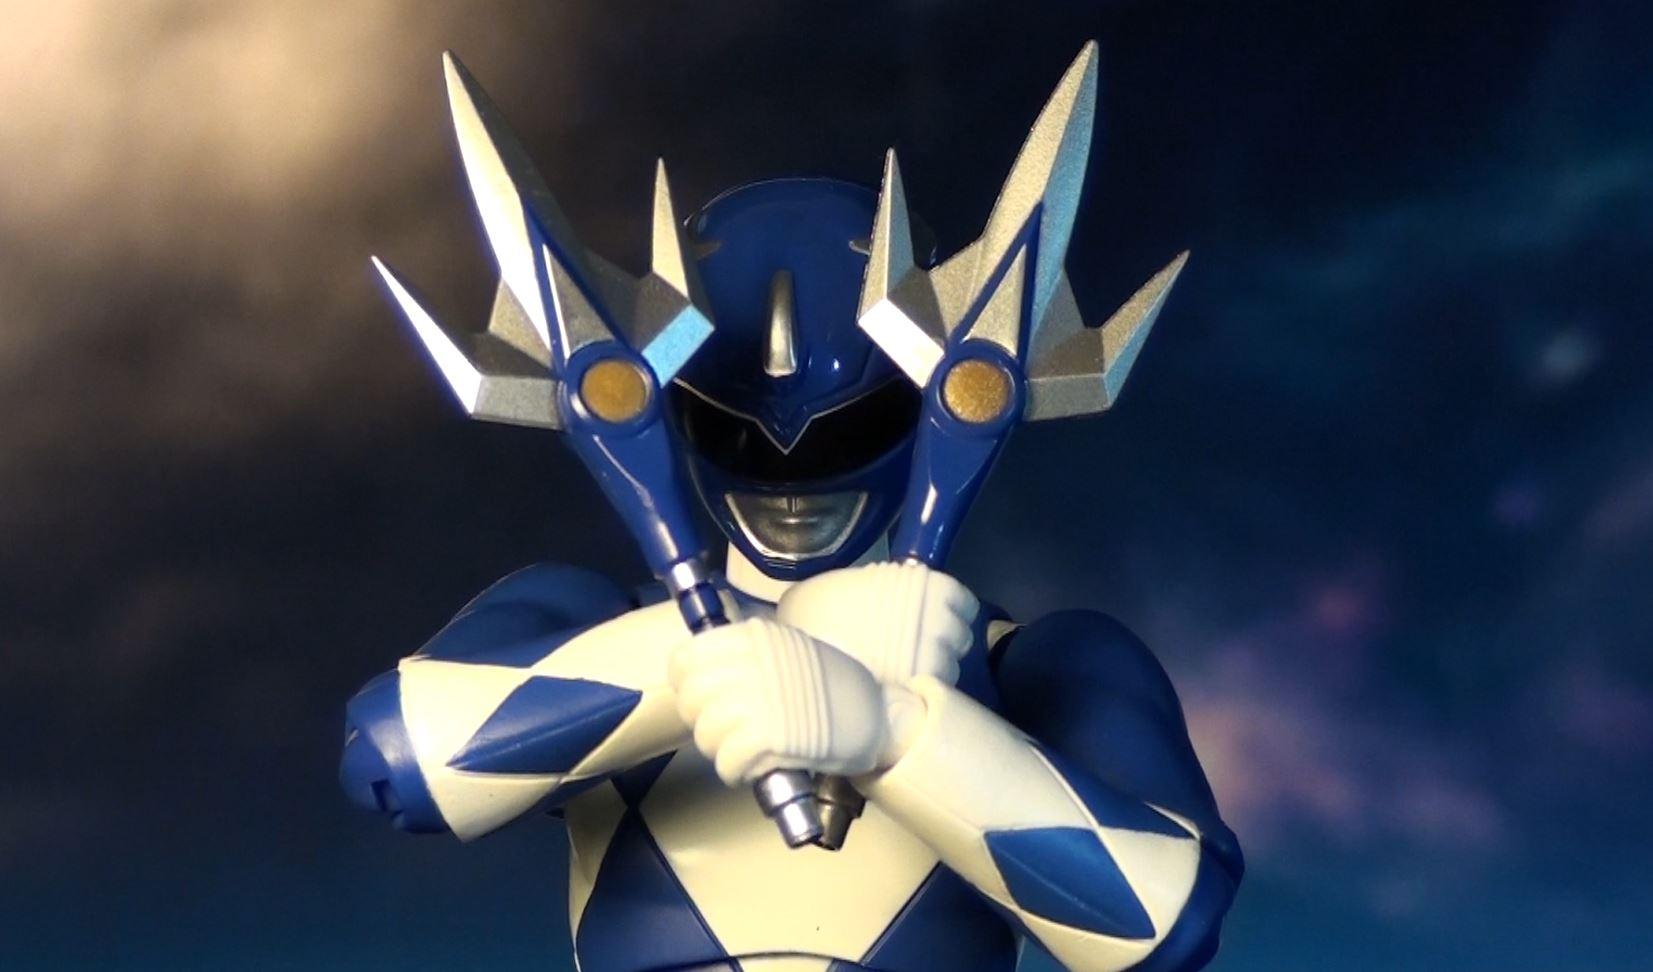 Bandai S H Figuarts Super Sentai Welcome To Hdtoytheater